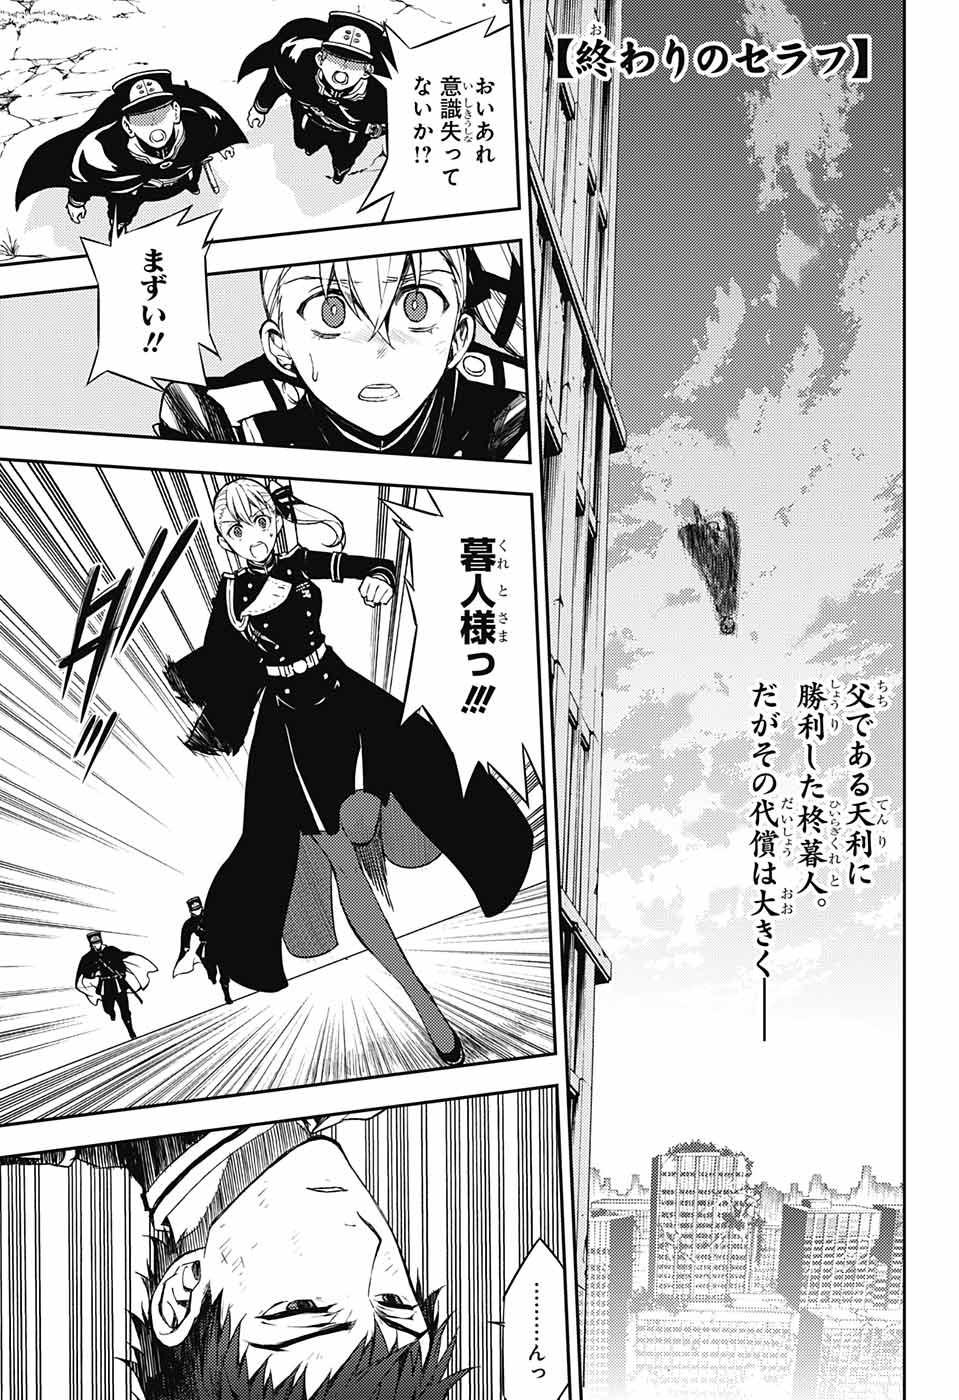 Owari no Seraph - Chapter 58 - Page 1